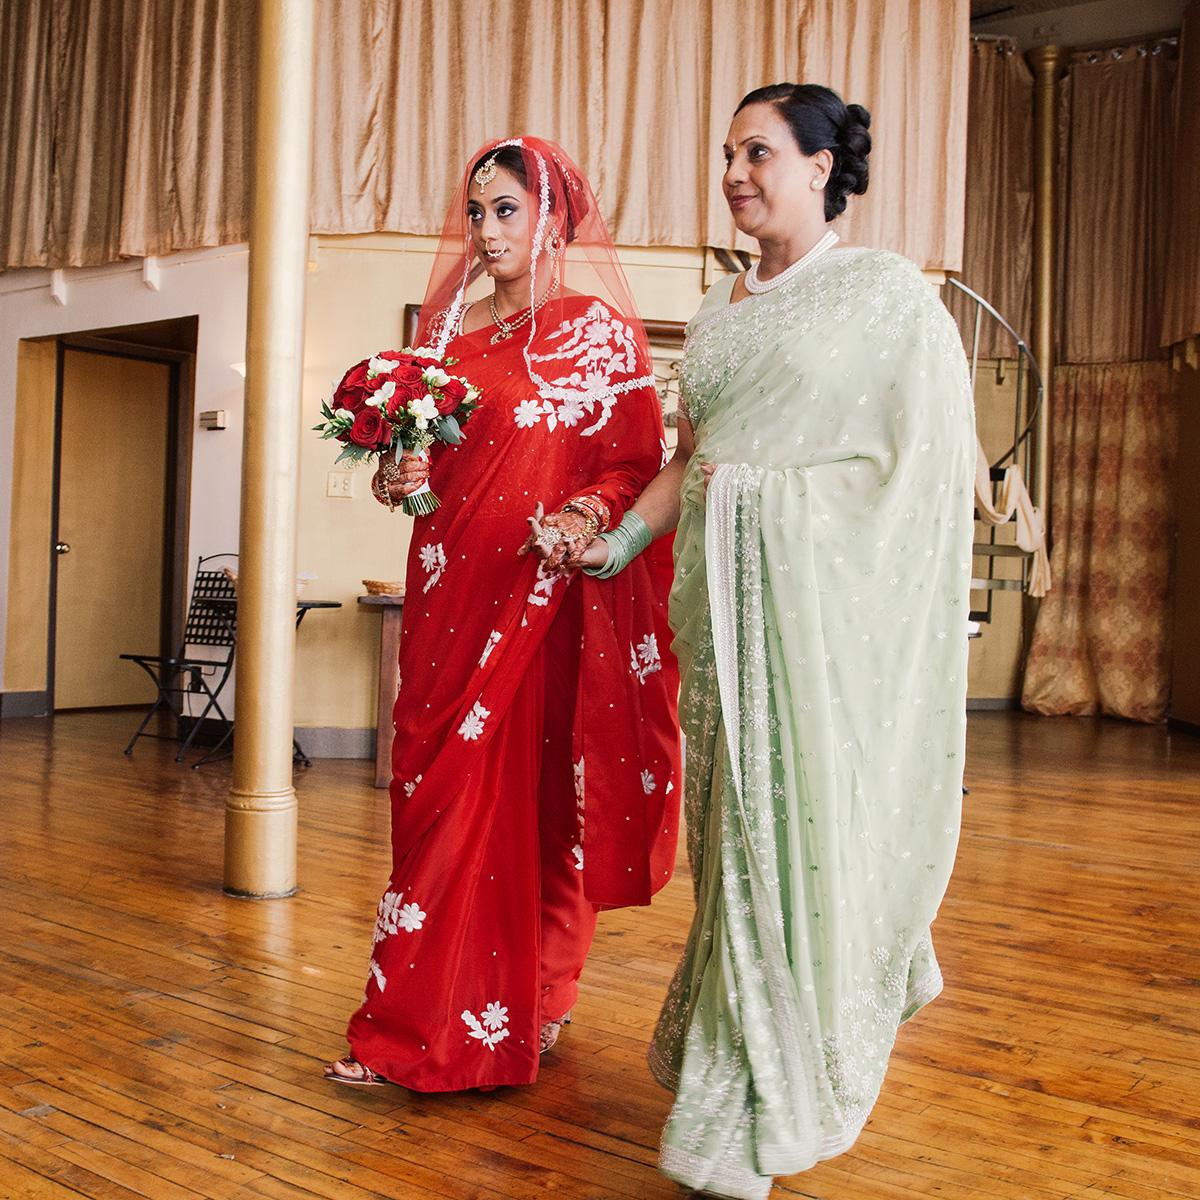 04-SharJeff-indian-wedding-Creativo.jpg